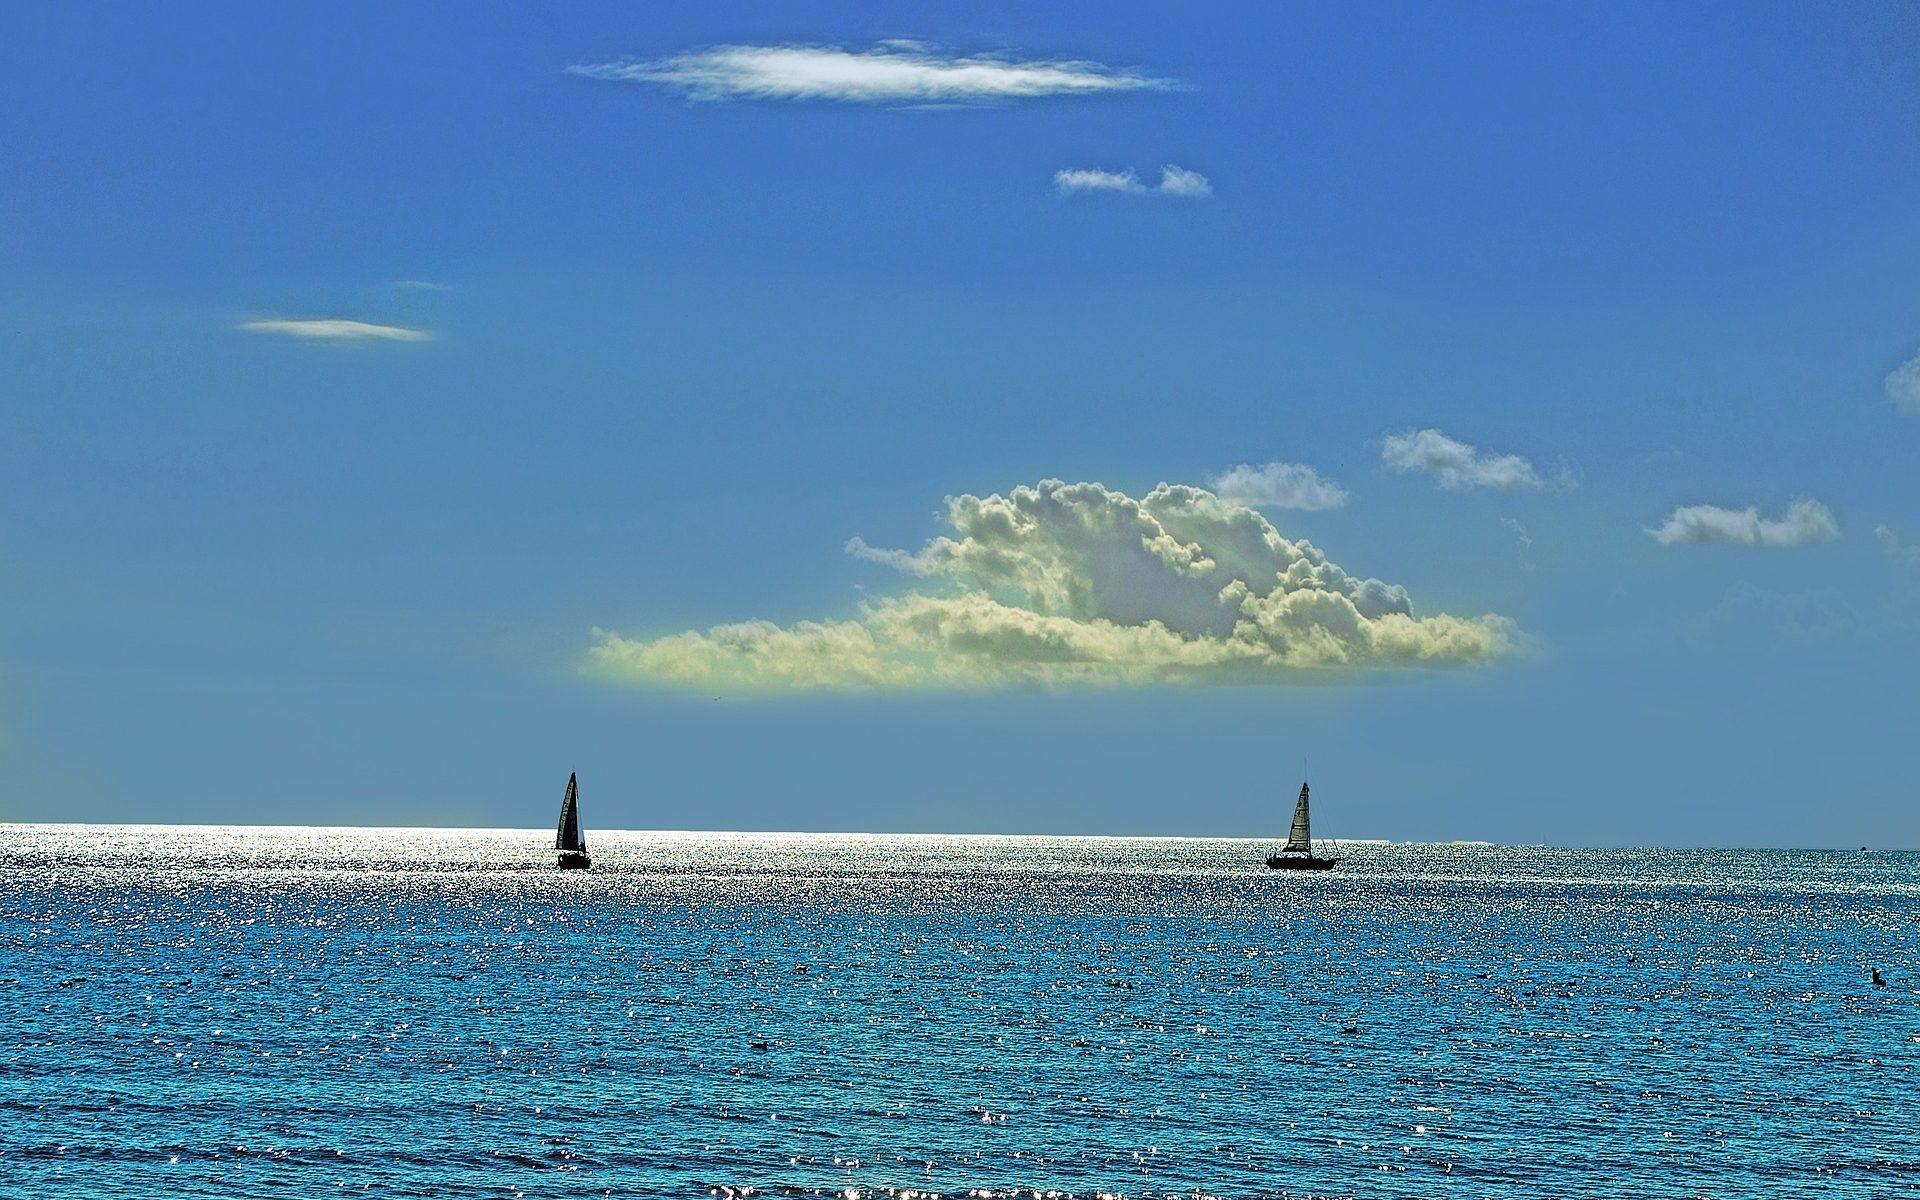 Praxis am See - Segelboote